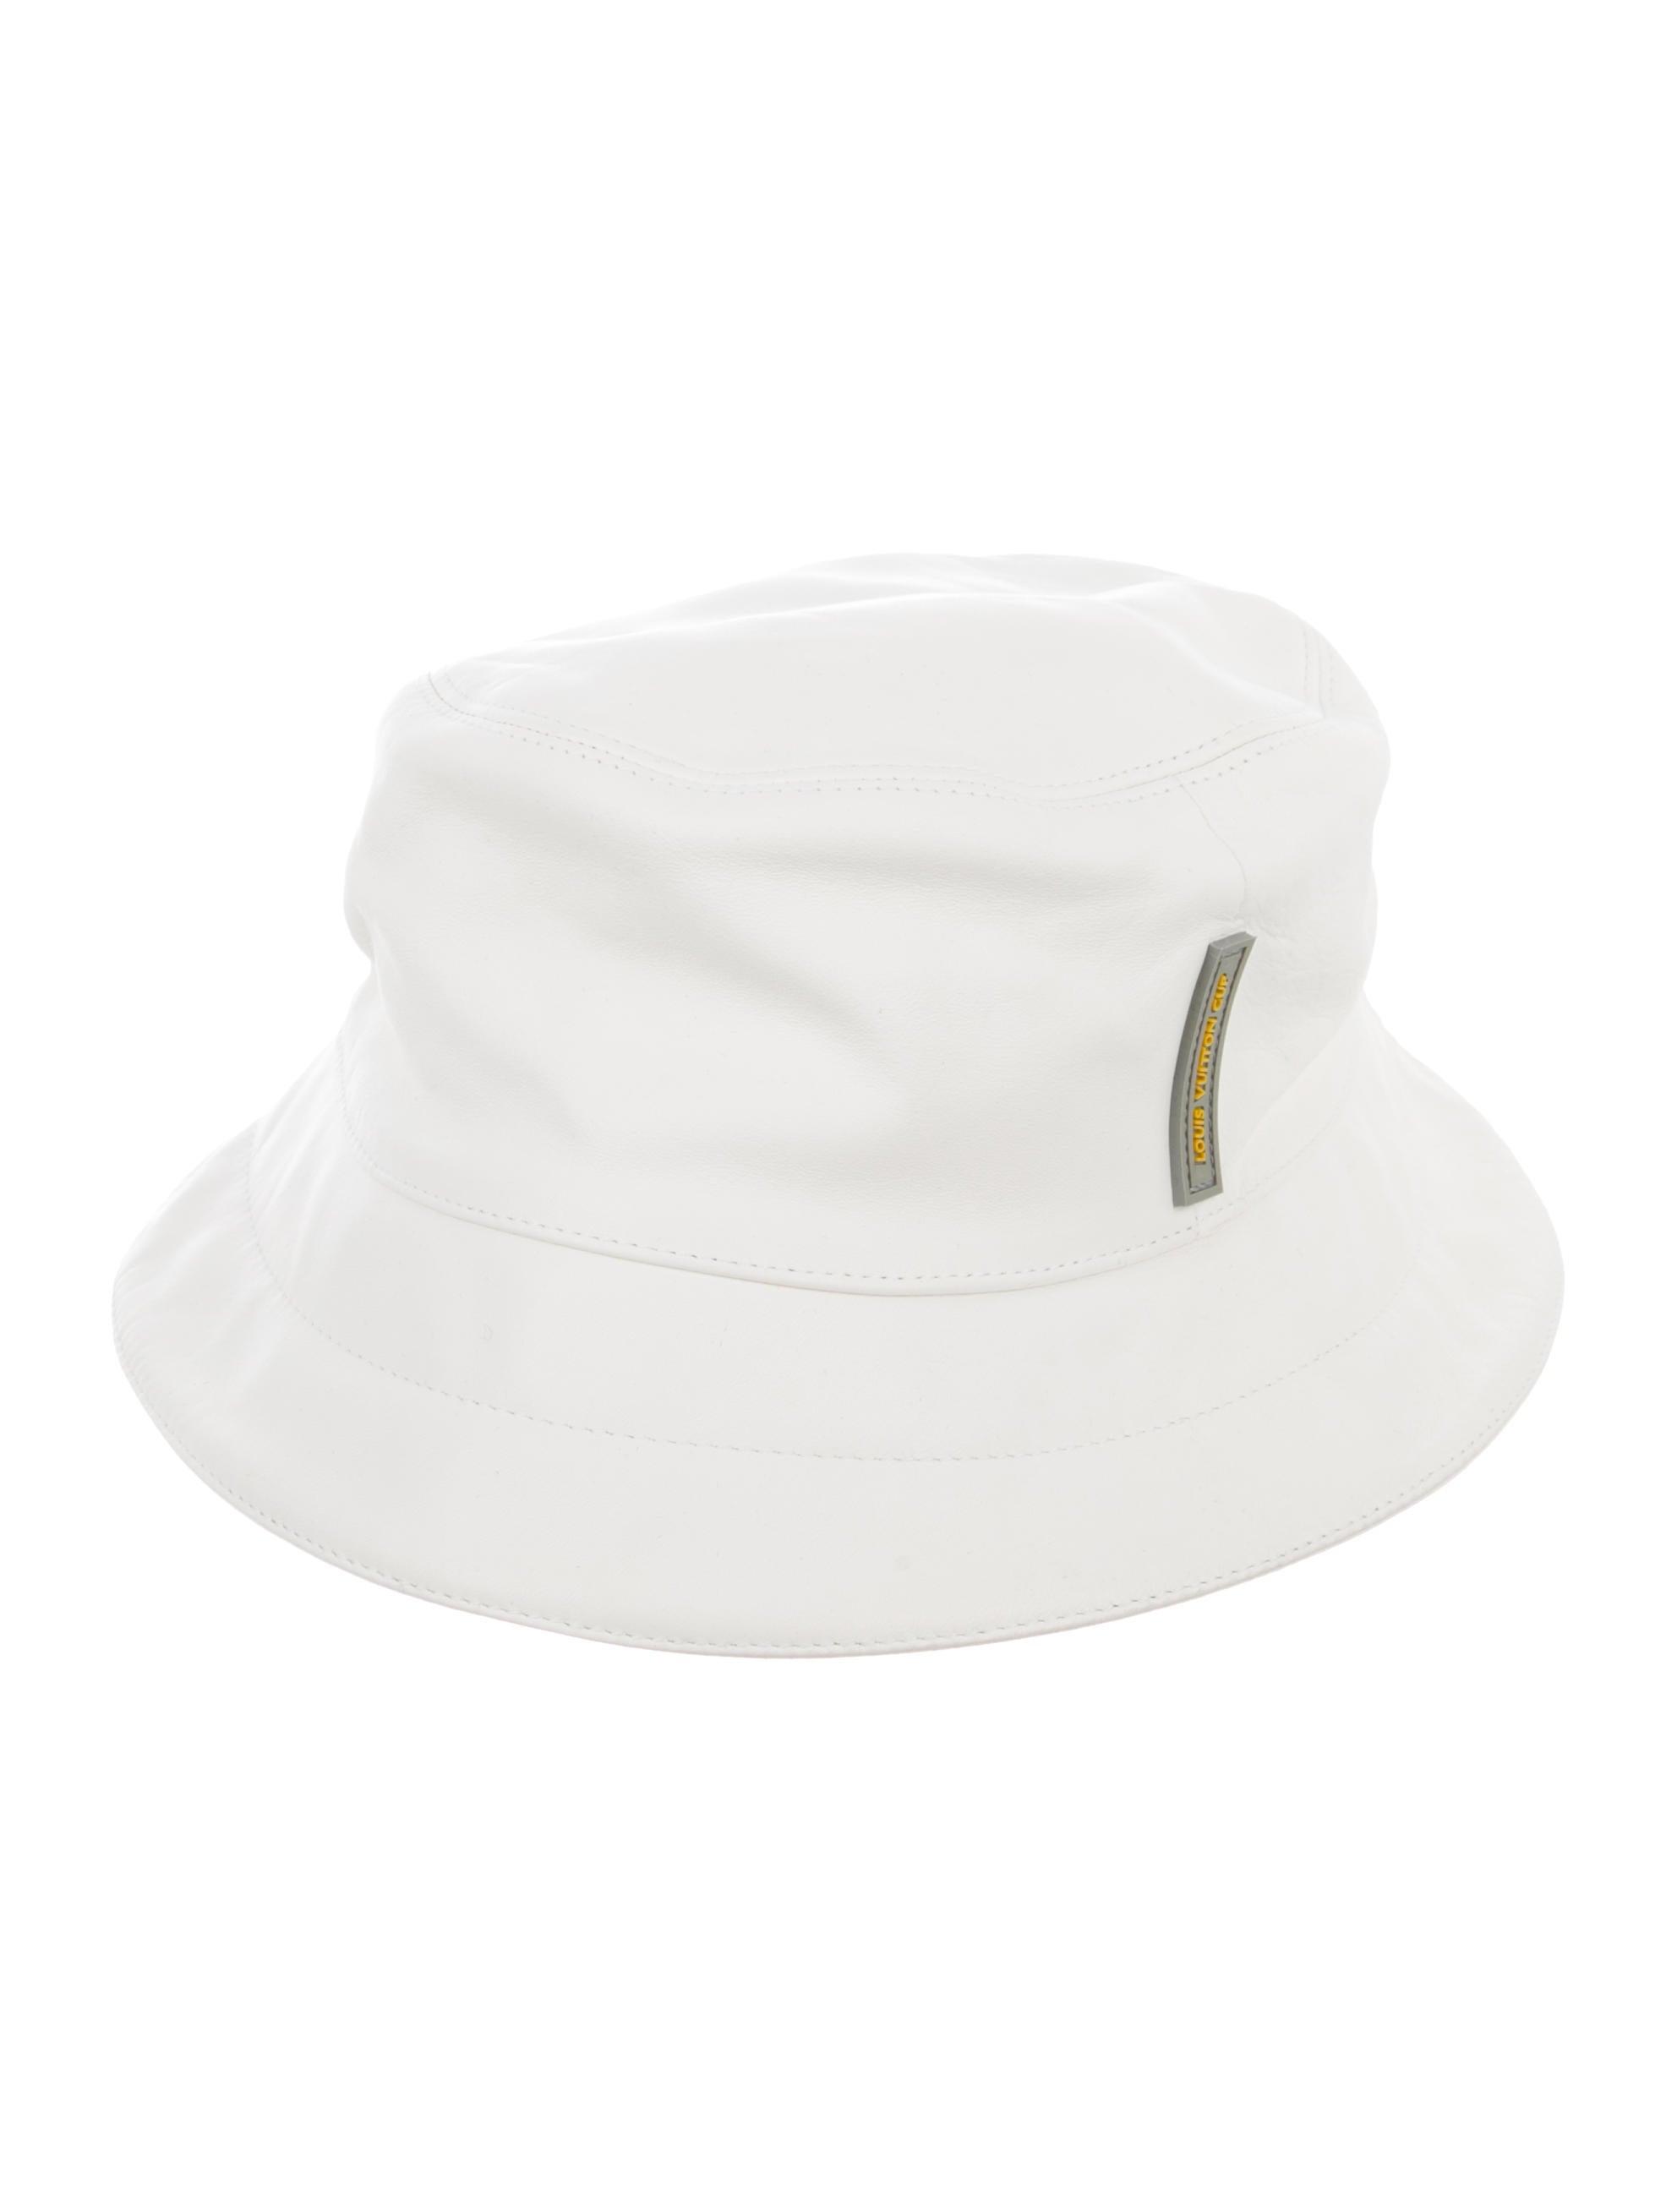 d8a2d07d47e Louis Vuitton America s Cup Leather Bucket Hat - Accessories ...